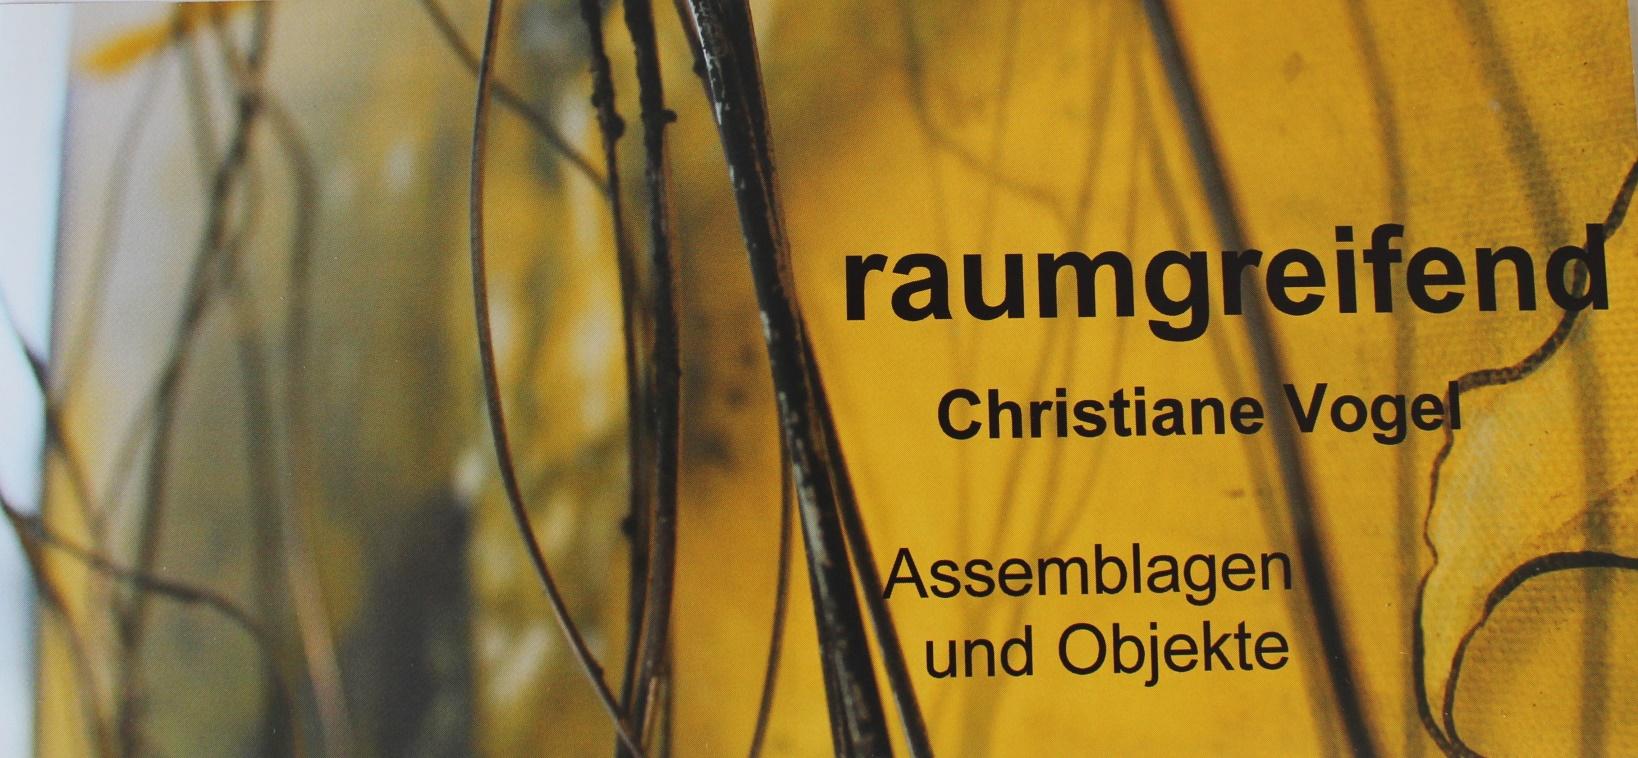 "KUNST IM RATHAUS ""raumgreifend"" –Christiane Vogel, Morsbach, Vernissage am 12.08.2019, 18.00 Uhr – Foyer Bürgerdorf am Alsberg"